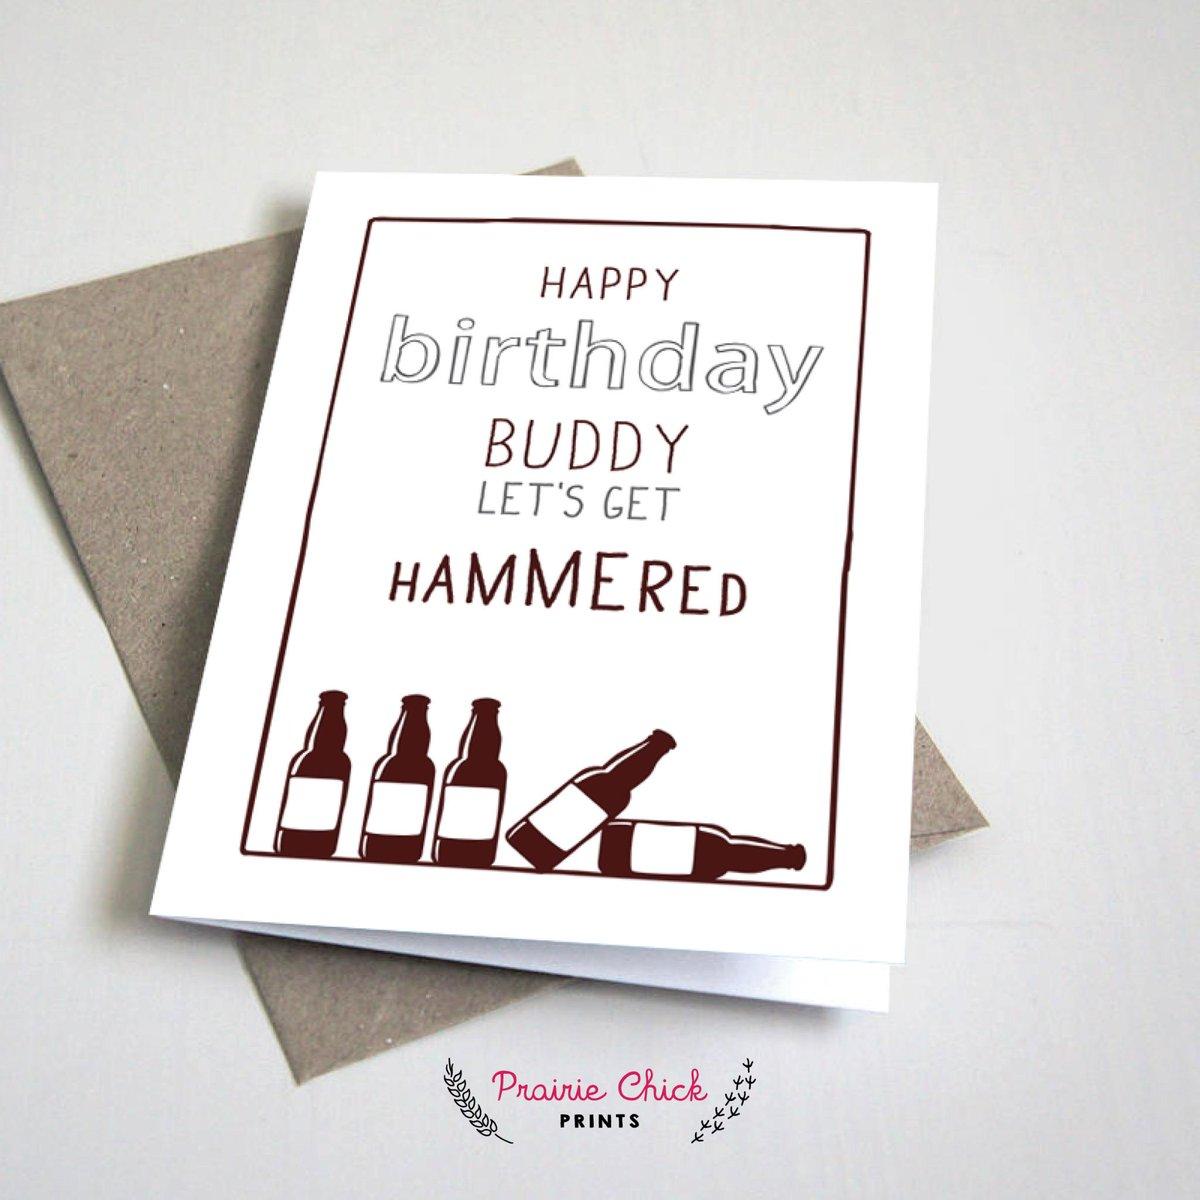 Prairie chick prints on twitter happy birthday buddy lets get prairie chick prints on twitter happy birthday buddy lets get hammered card httptfjdsf2t1b7 etsy canadian slang hammered yeg shoplocal m4hsunfo